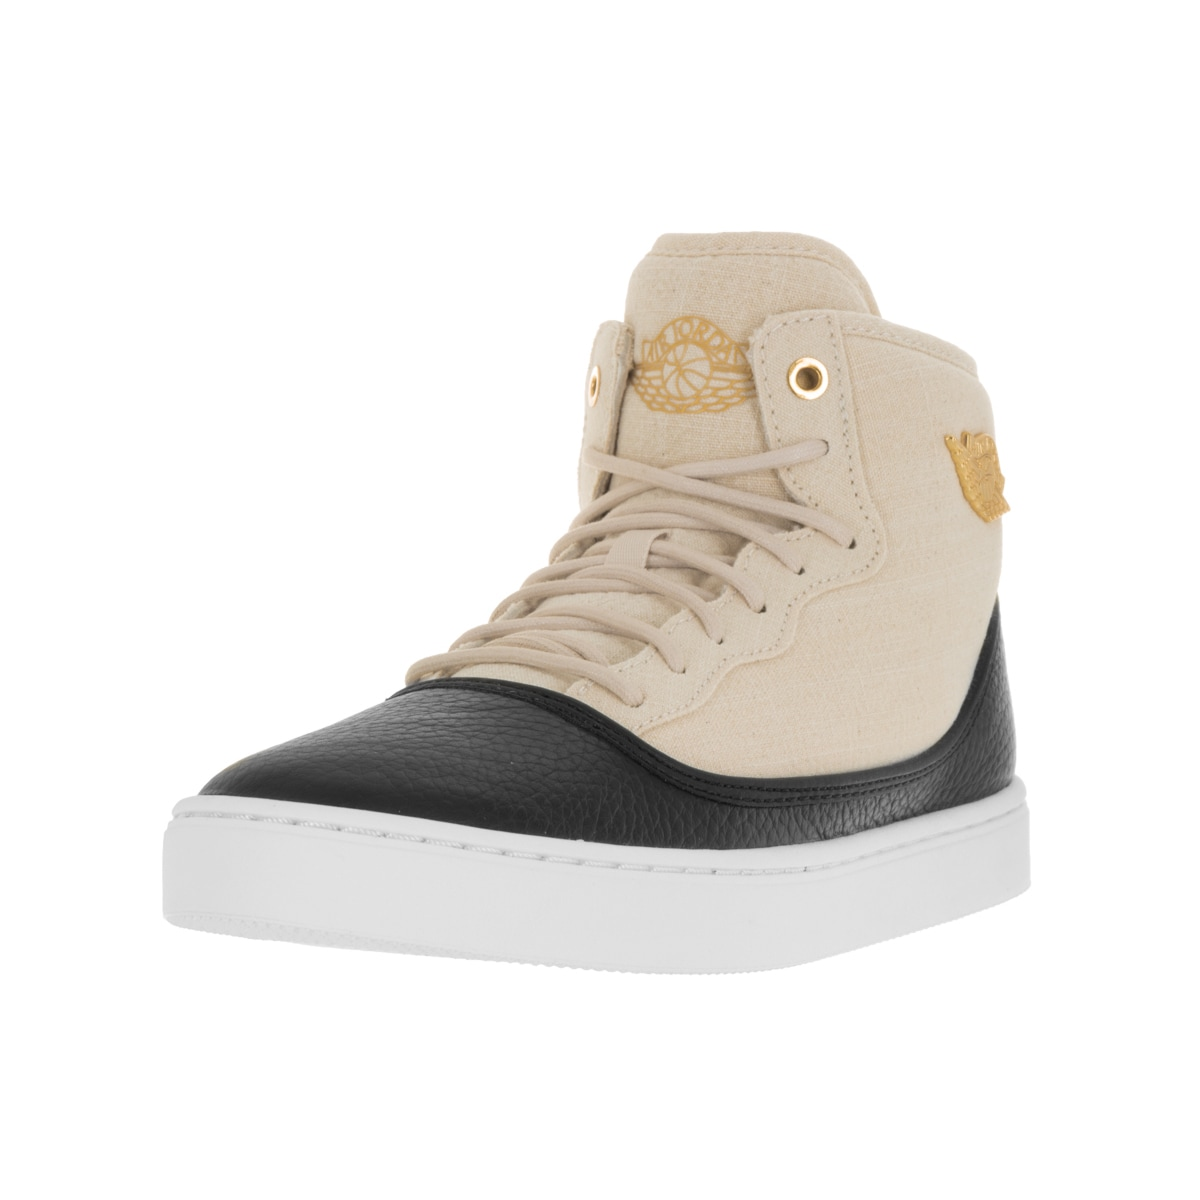 Nike Jordan Kids Jasmine Black/Off-white (Beige) Leather ...